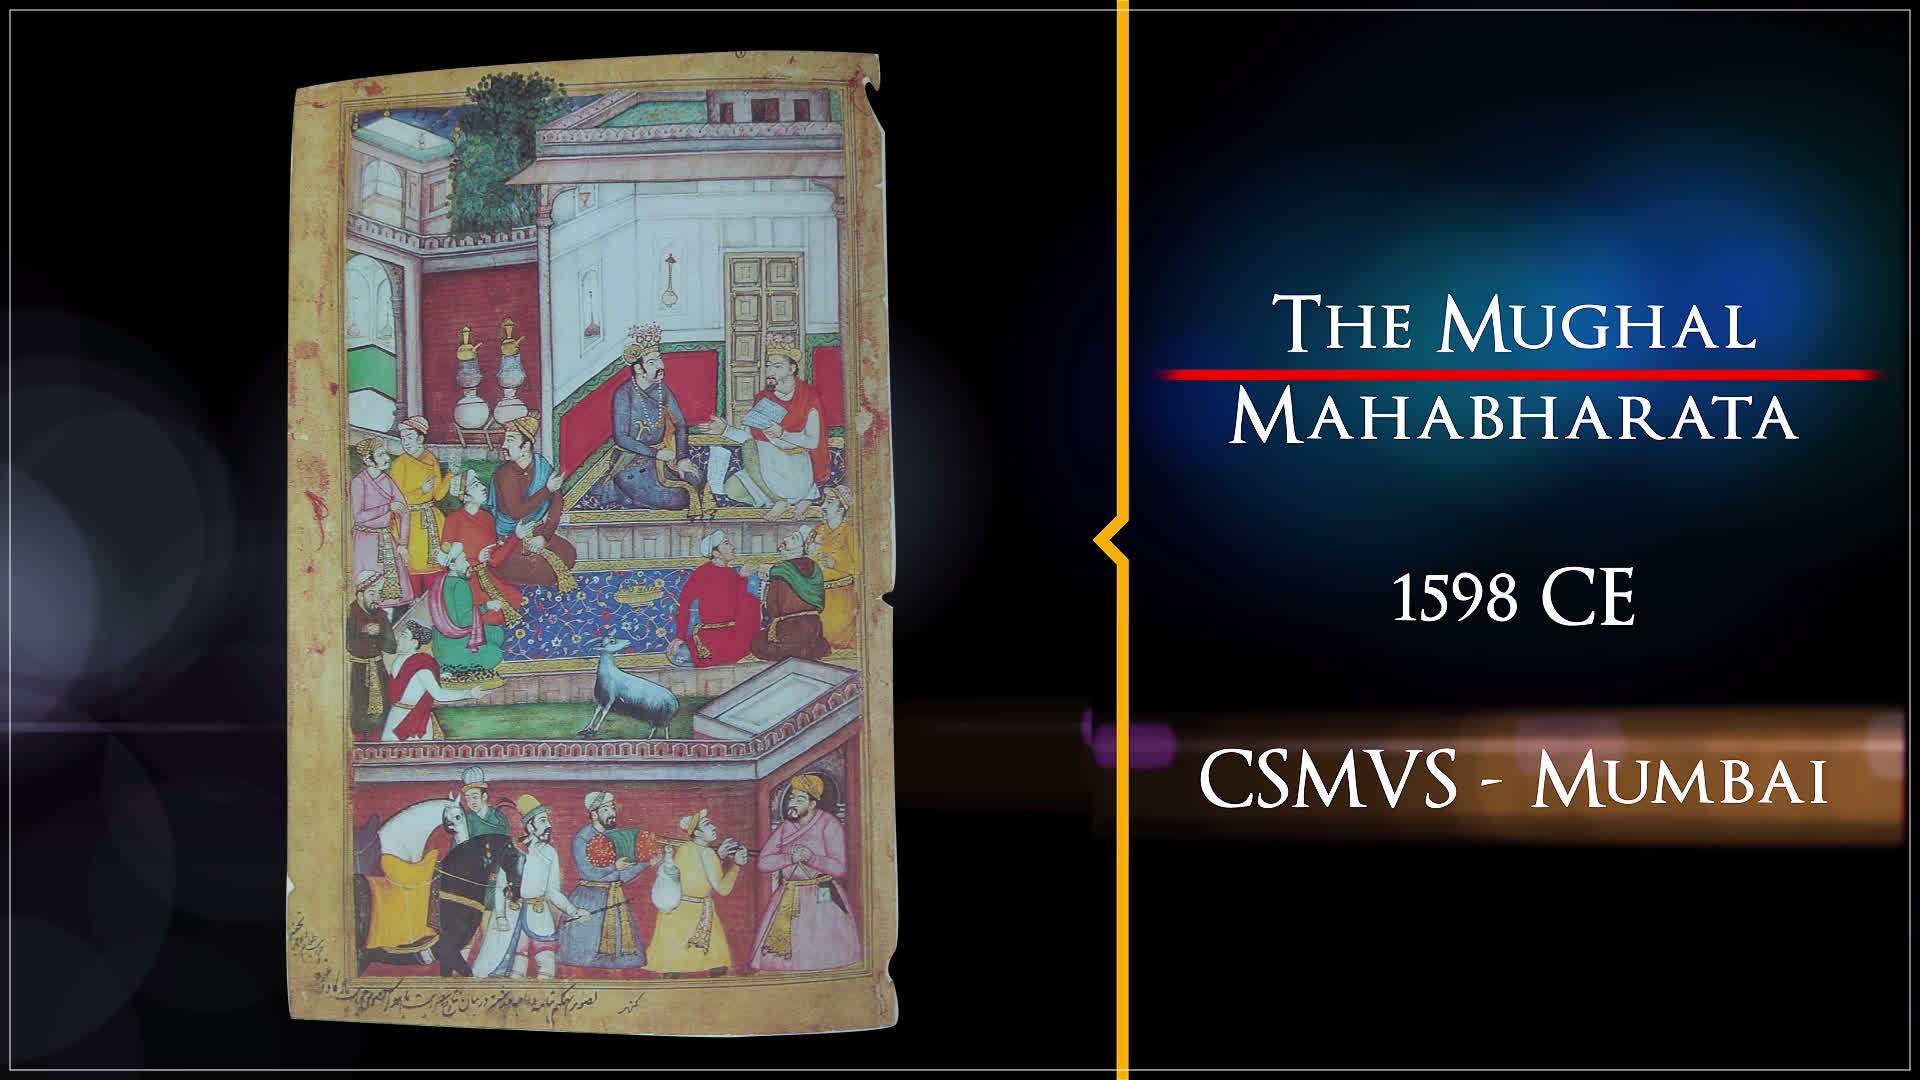 The Mughal Mahabharata | Treasures of India